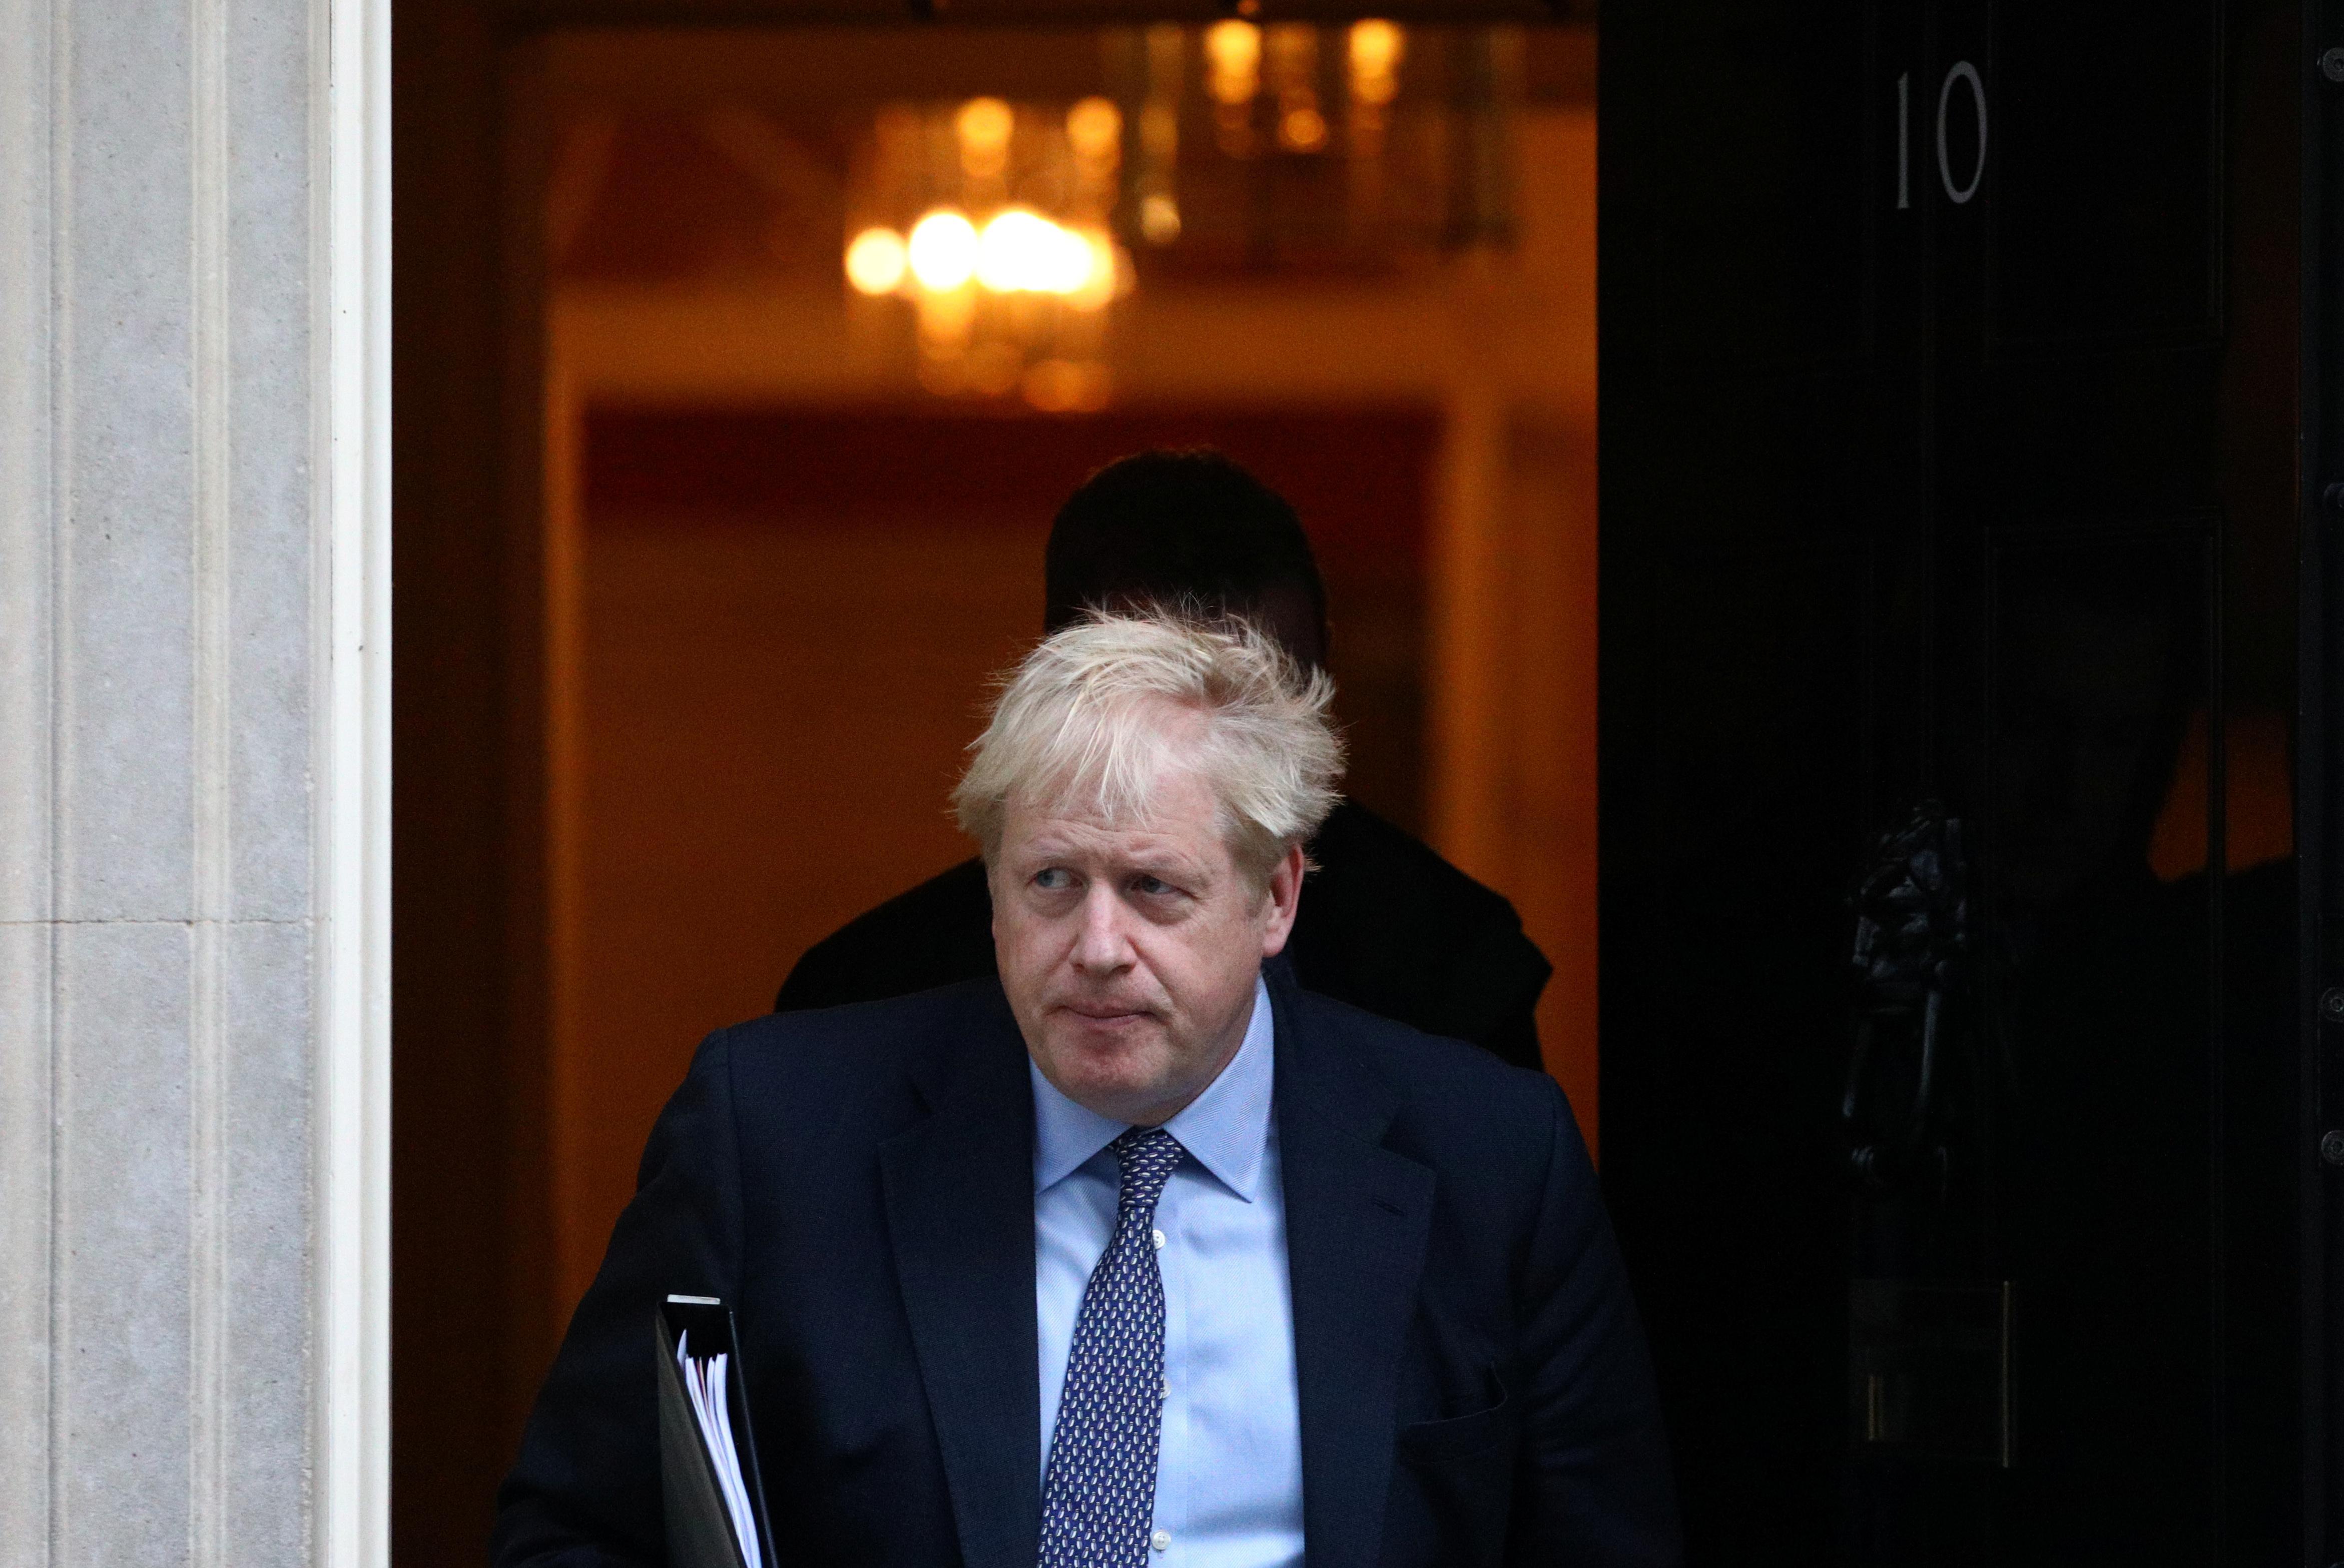 Brexit will happen on Oct. 31 despite PM's unsigned delay request,...